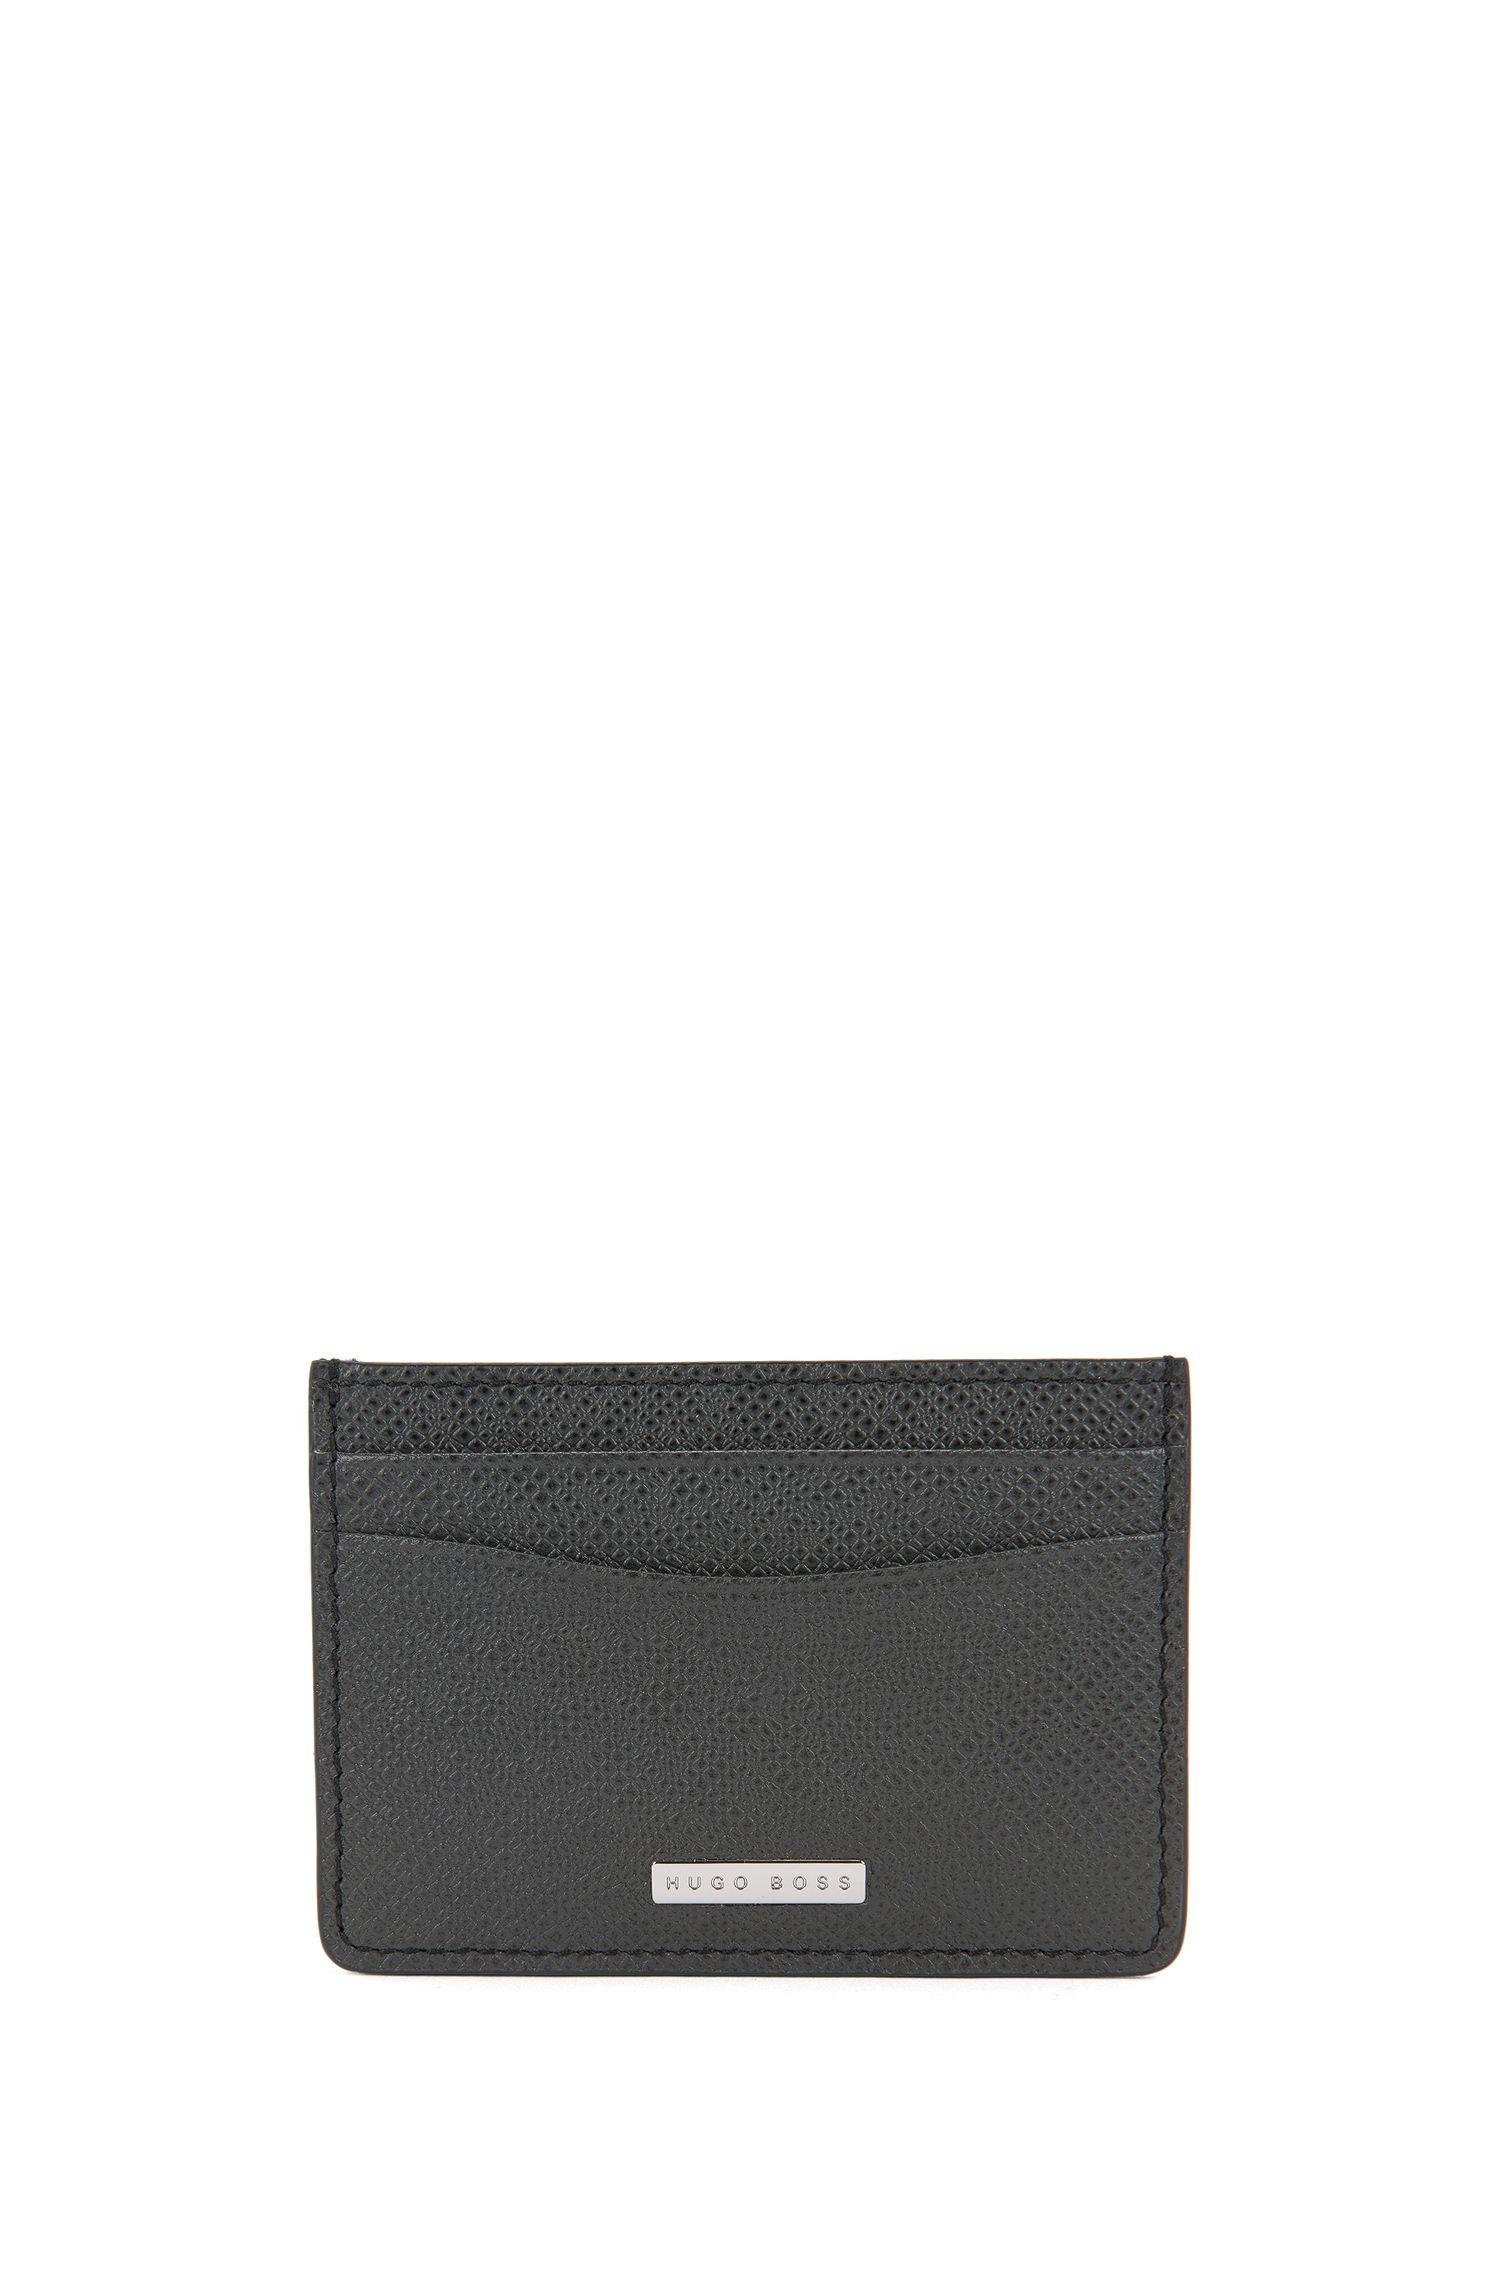 Porte-cartes à clip de la collection Signature en cuir palmellato